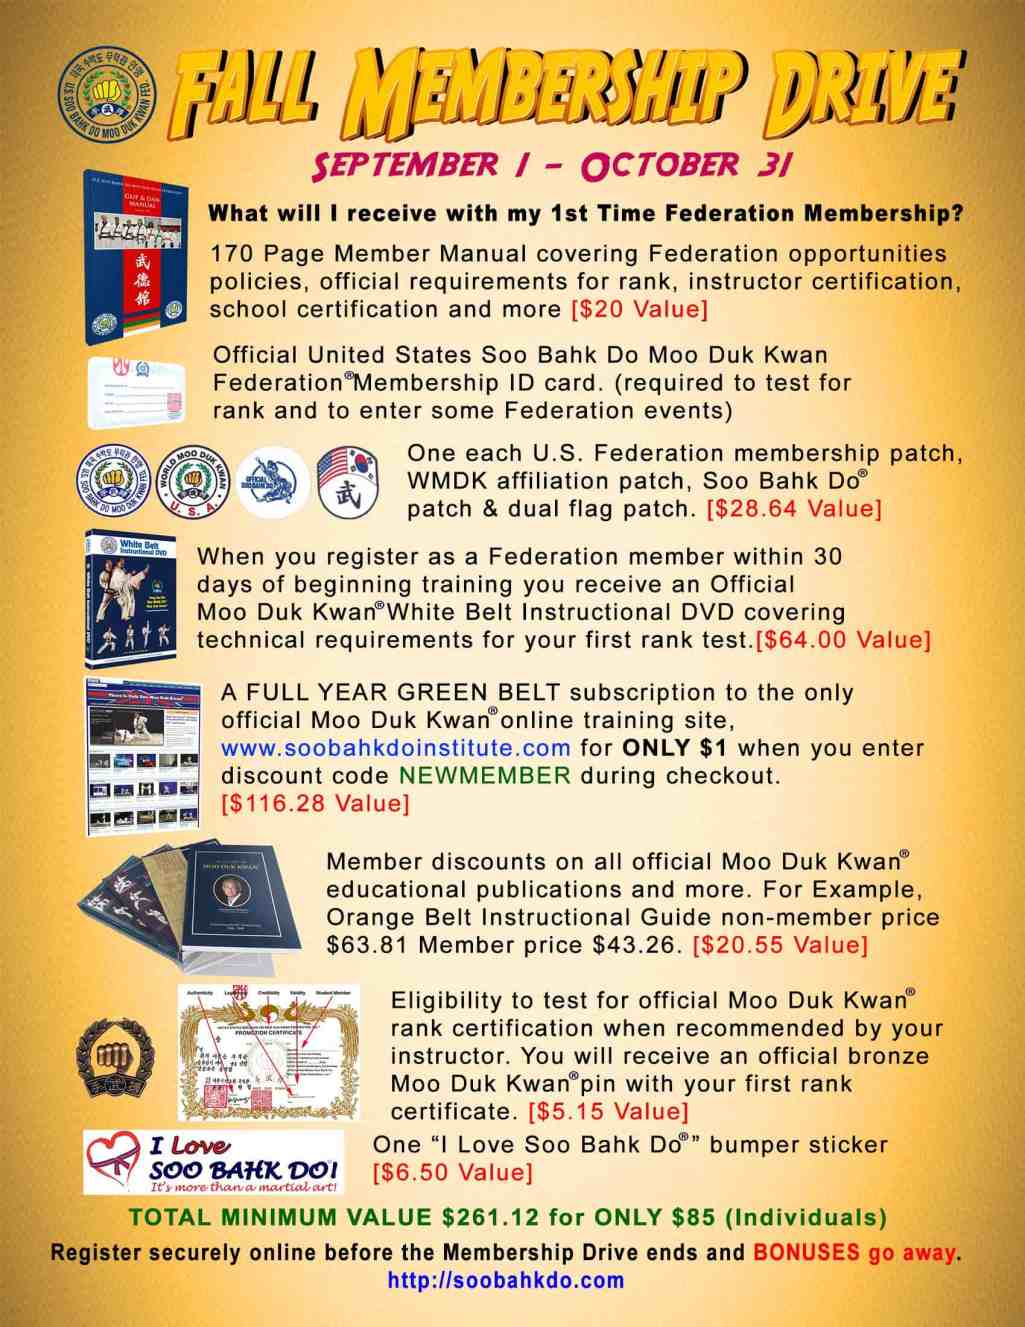 fall-membership-drive-new-member-benefits-v7-med-1700x2200